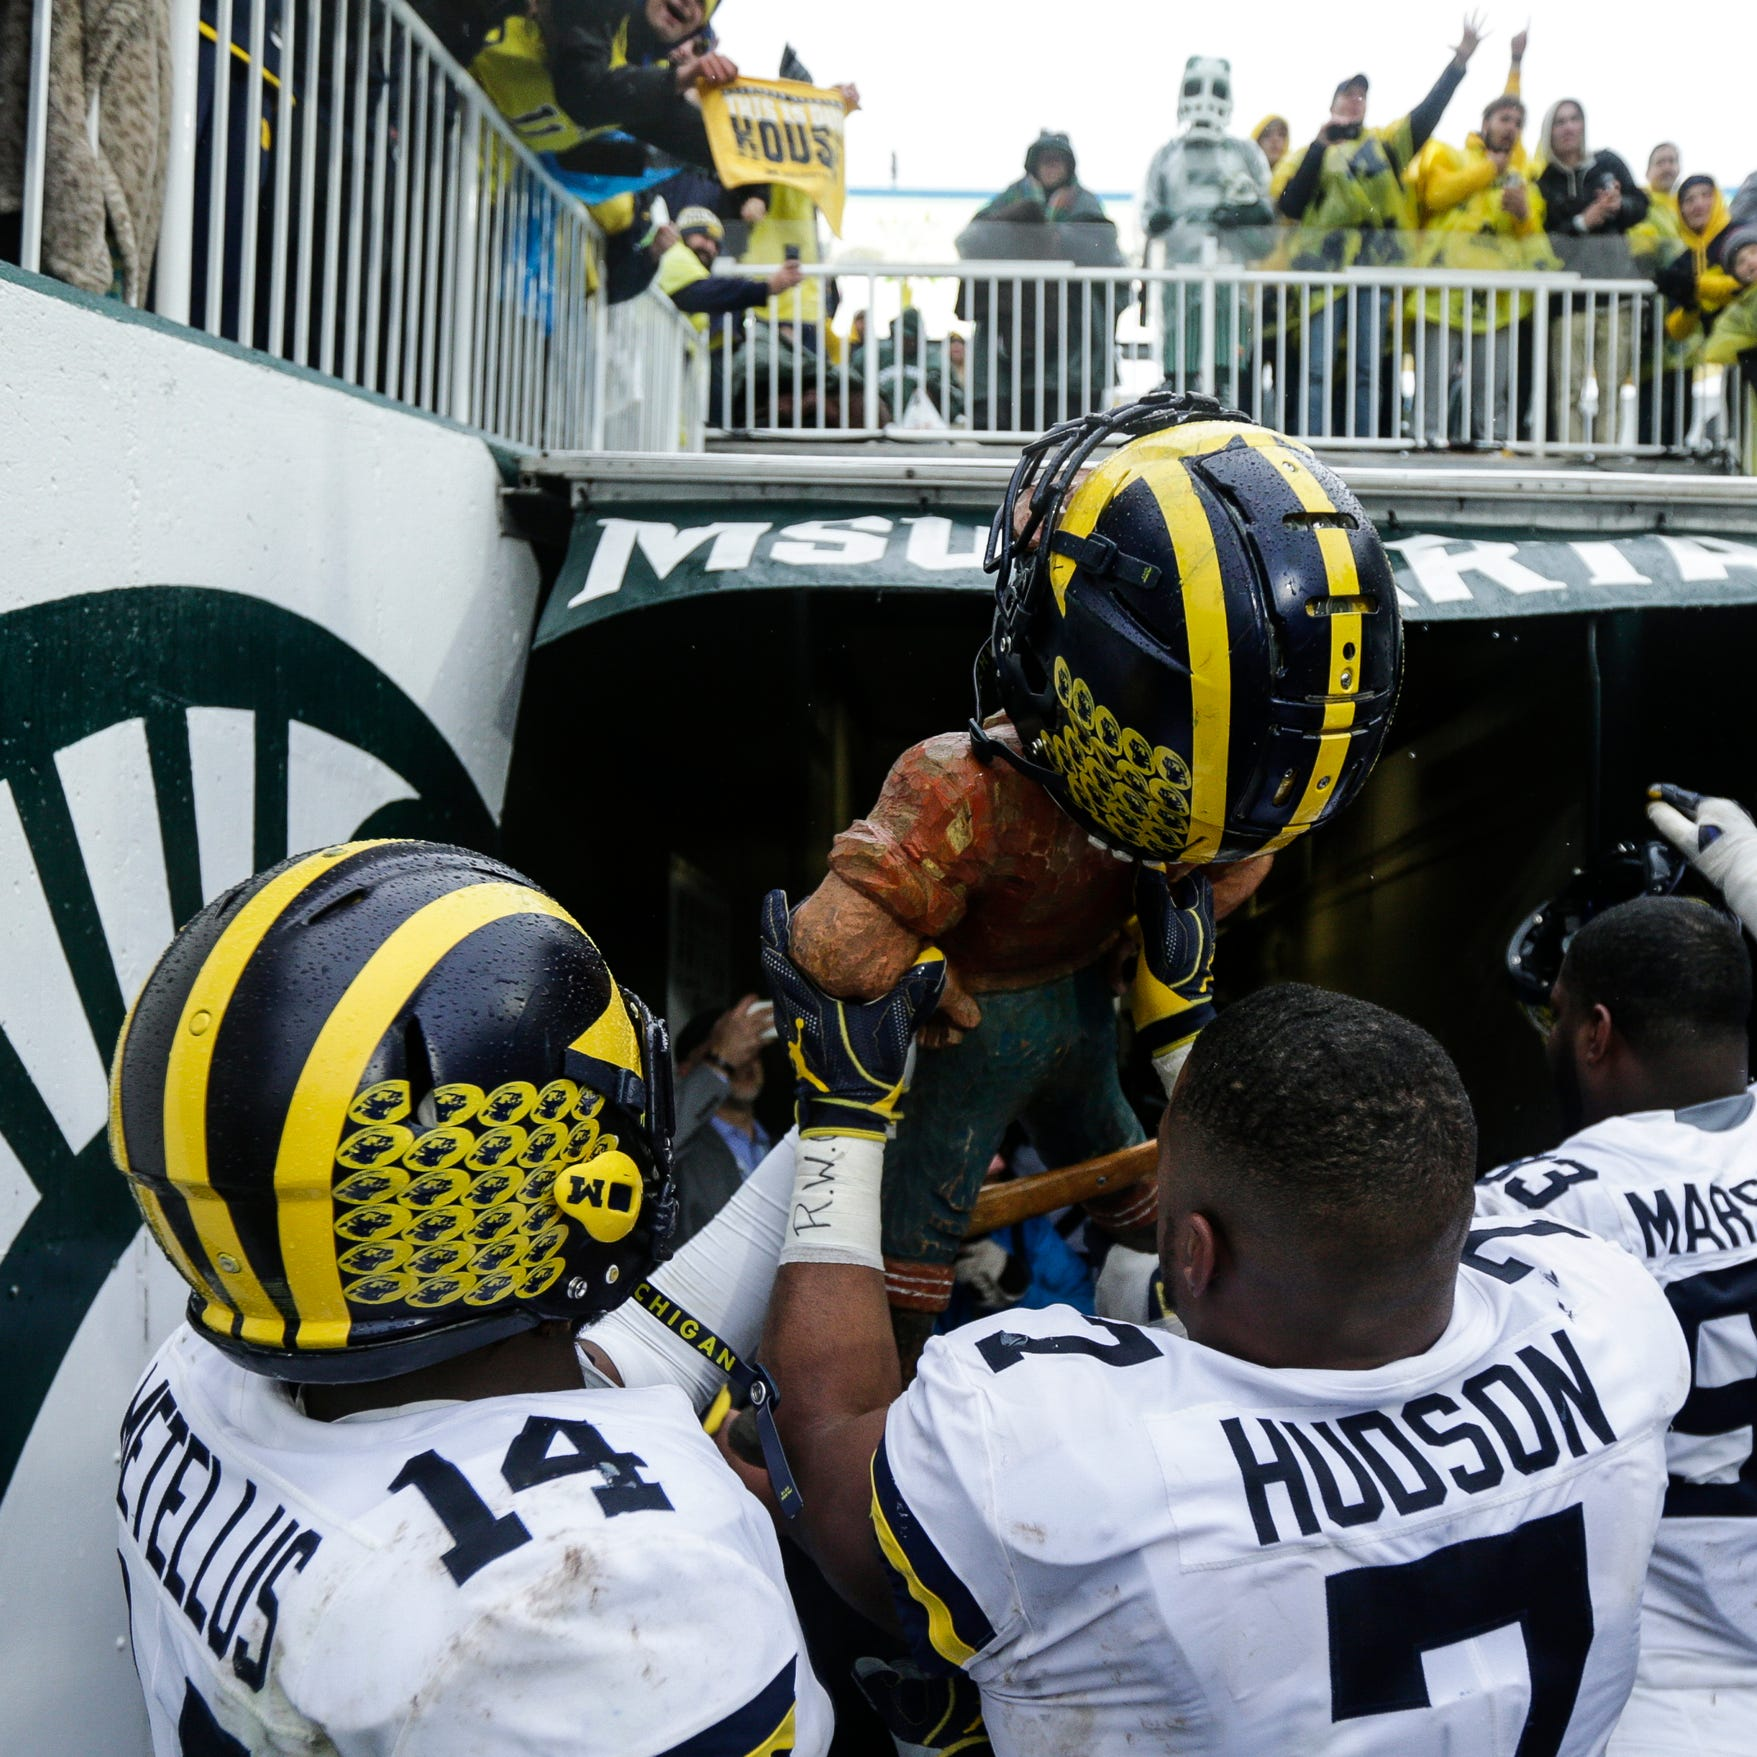 Michigan football pushes Michigan State around in physical 21-7 win